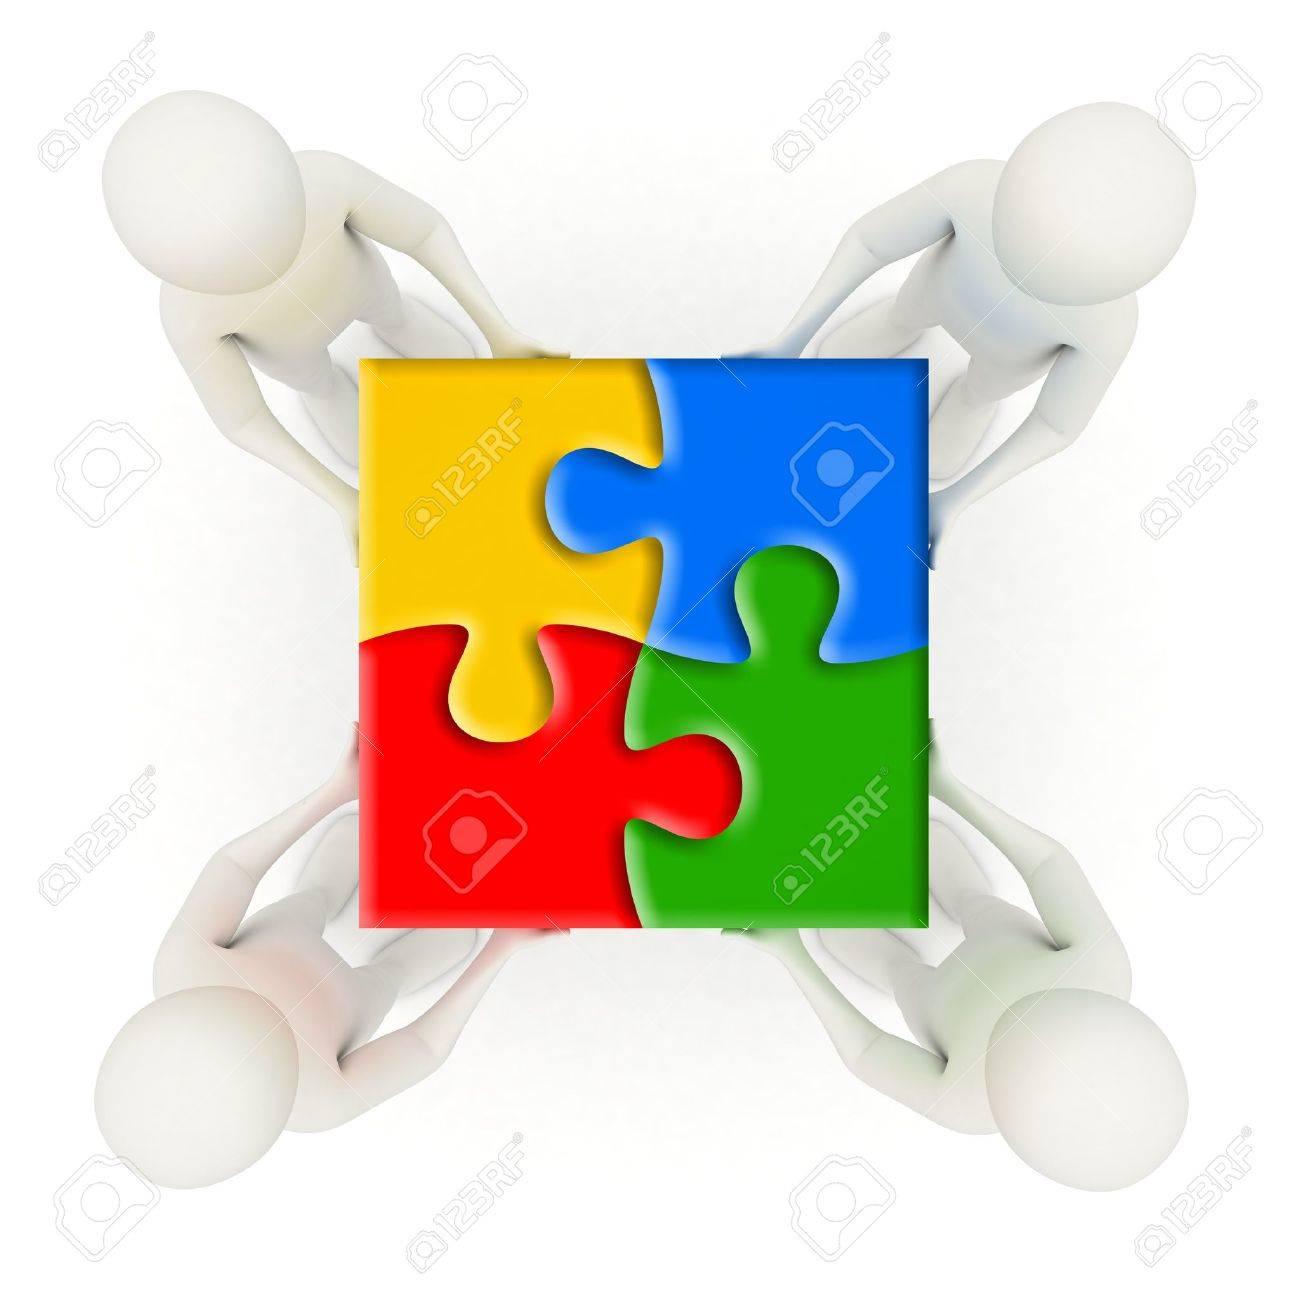 Four 3d men holding colorful, assembled jigsaw puzzle pieces Stock Photo - 9626186